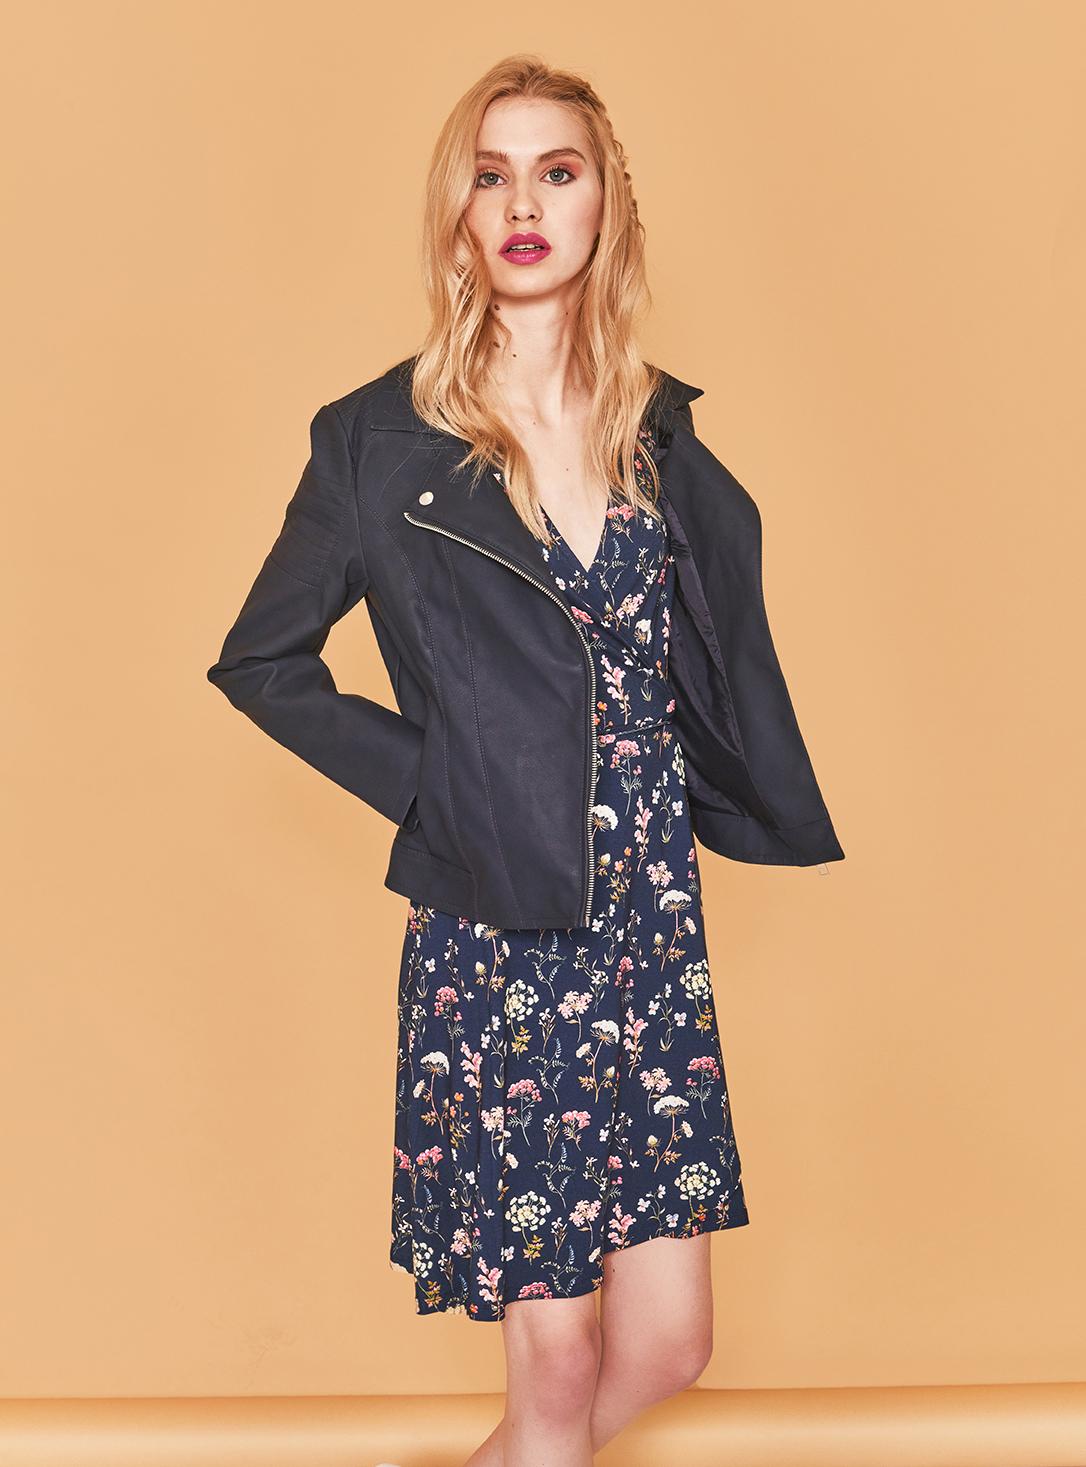 Esprit haljina 52,99 €  Only jakna 42,99 €